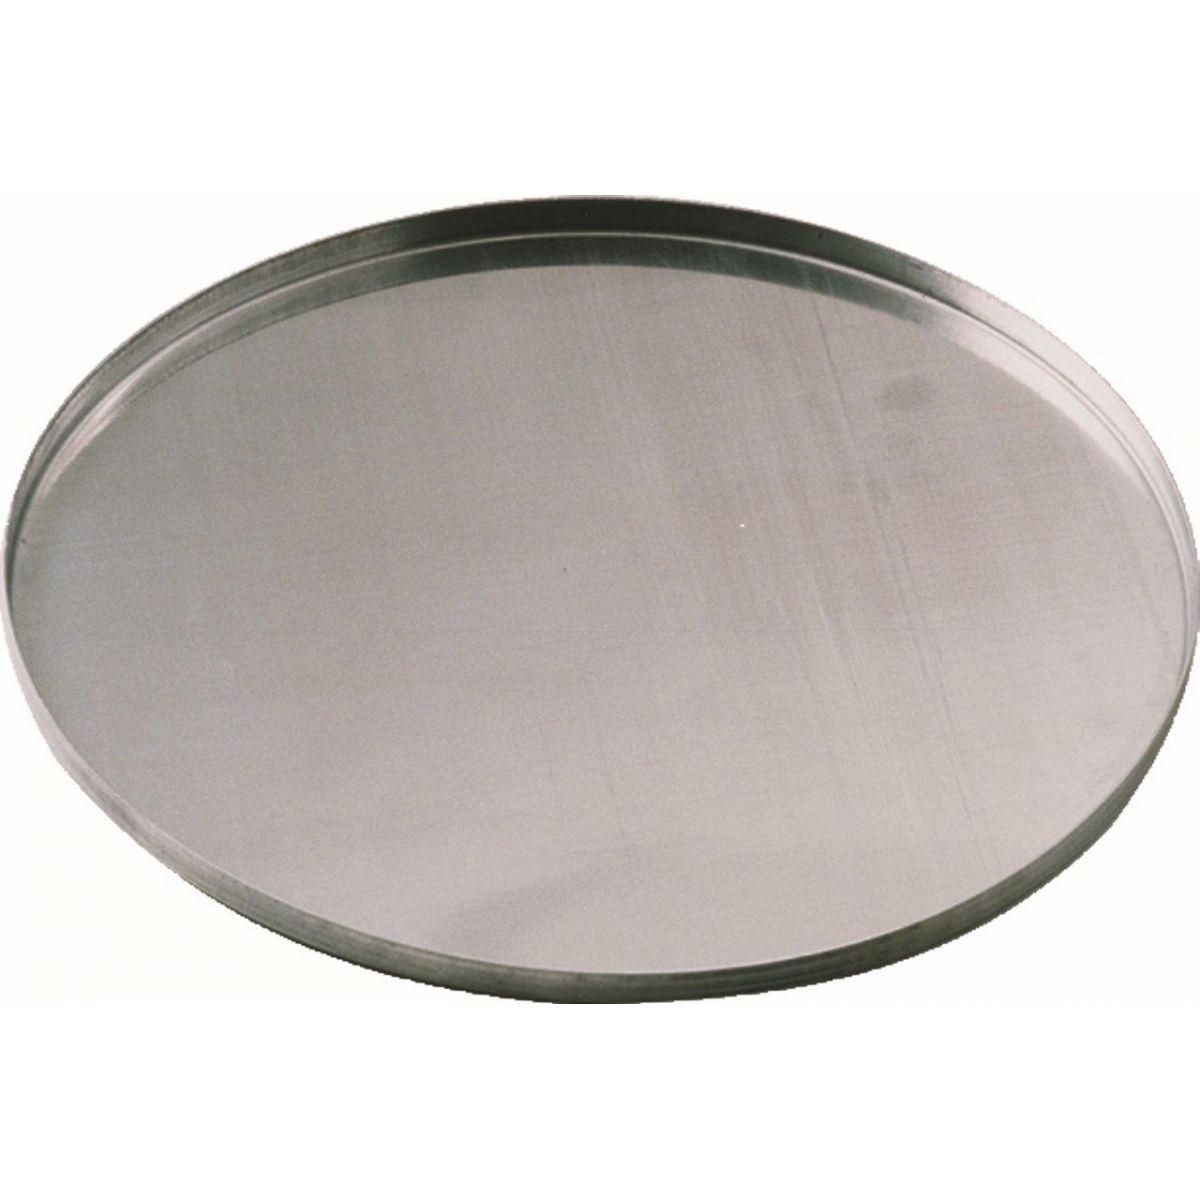 Forma P/ Pizza Nº 2 - 30 cm - Alumínio